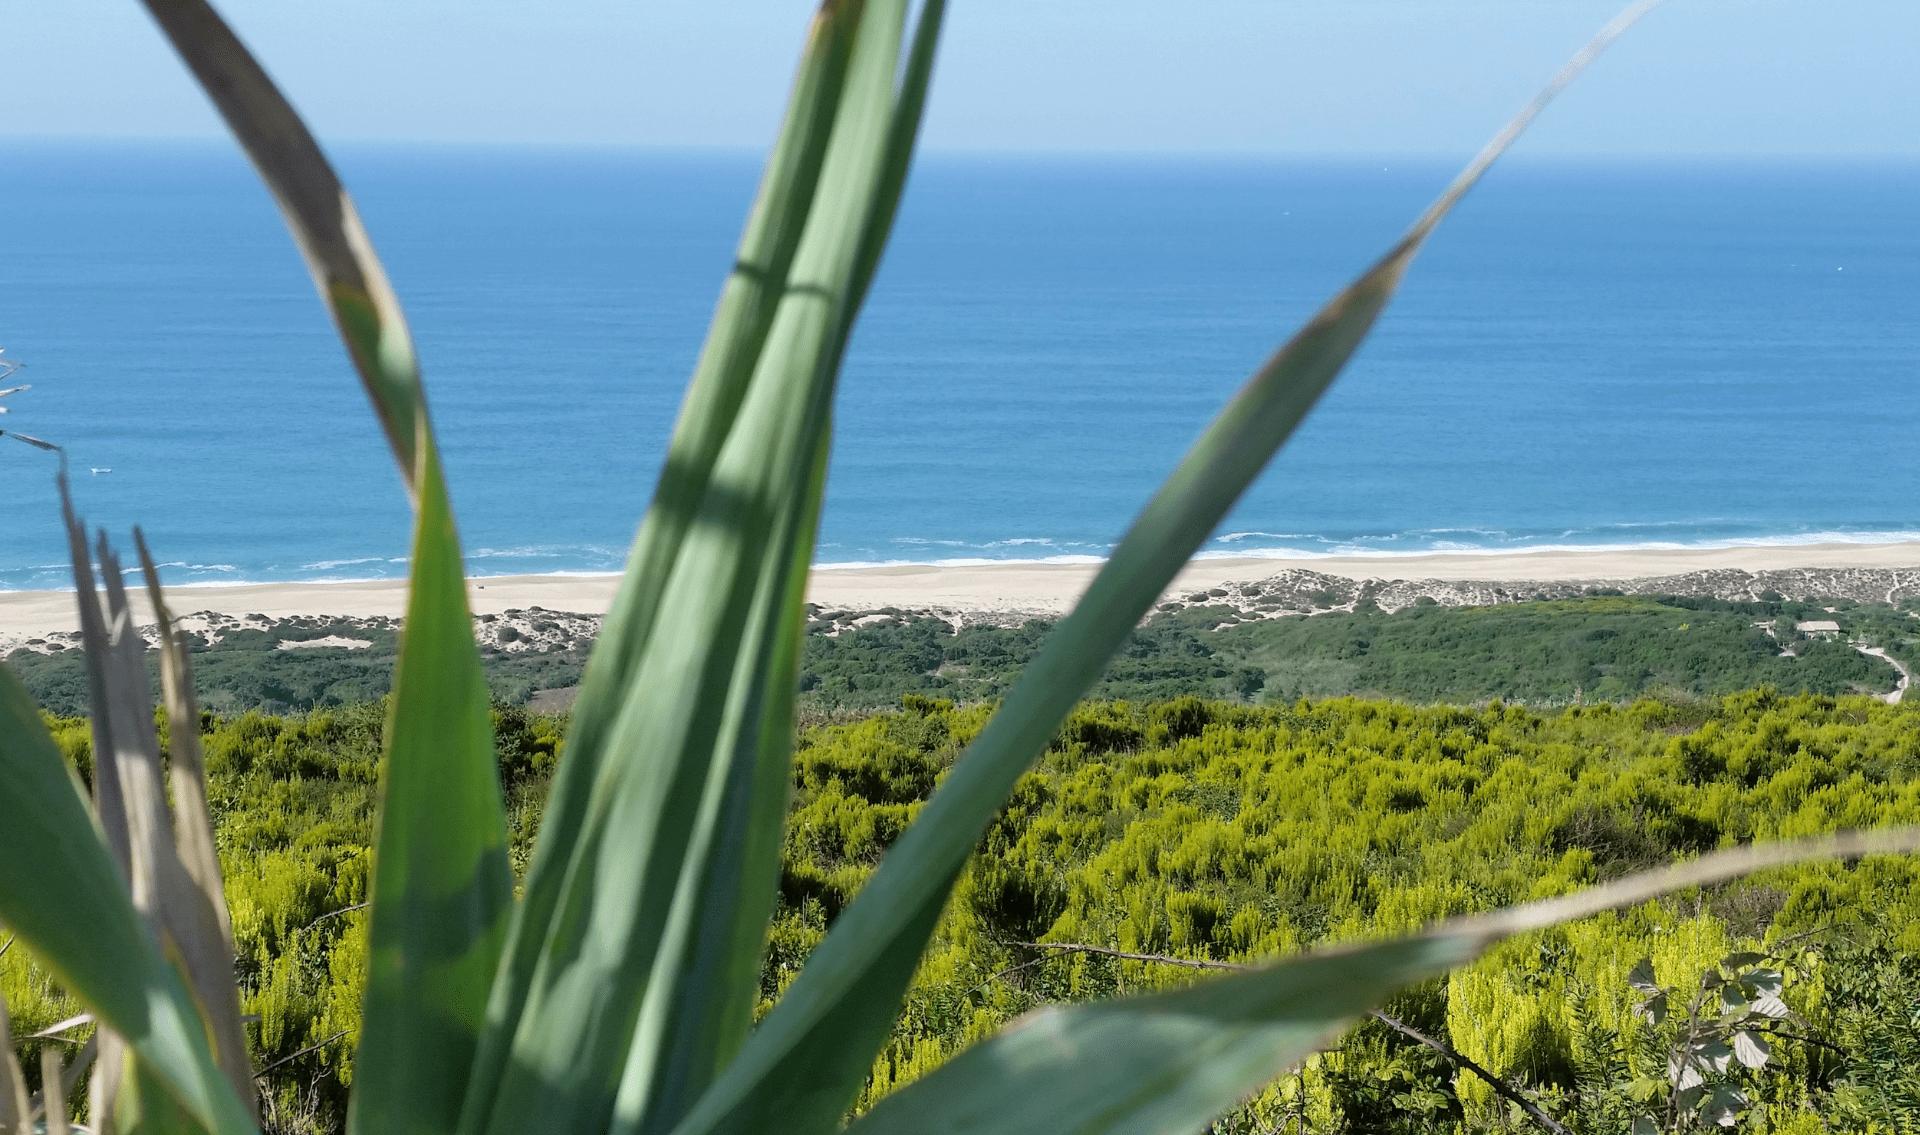 Fietsvakantie langs de Zilverkust in Portugal - Costa da Prata